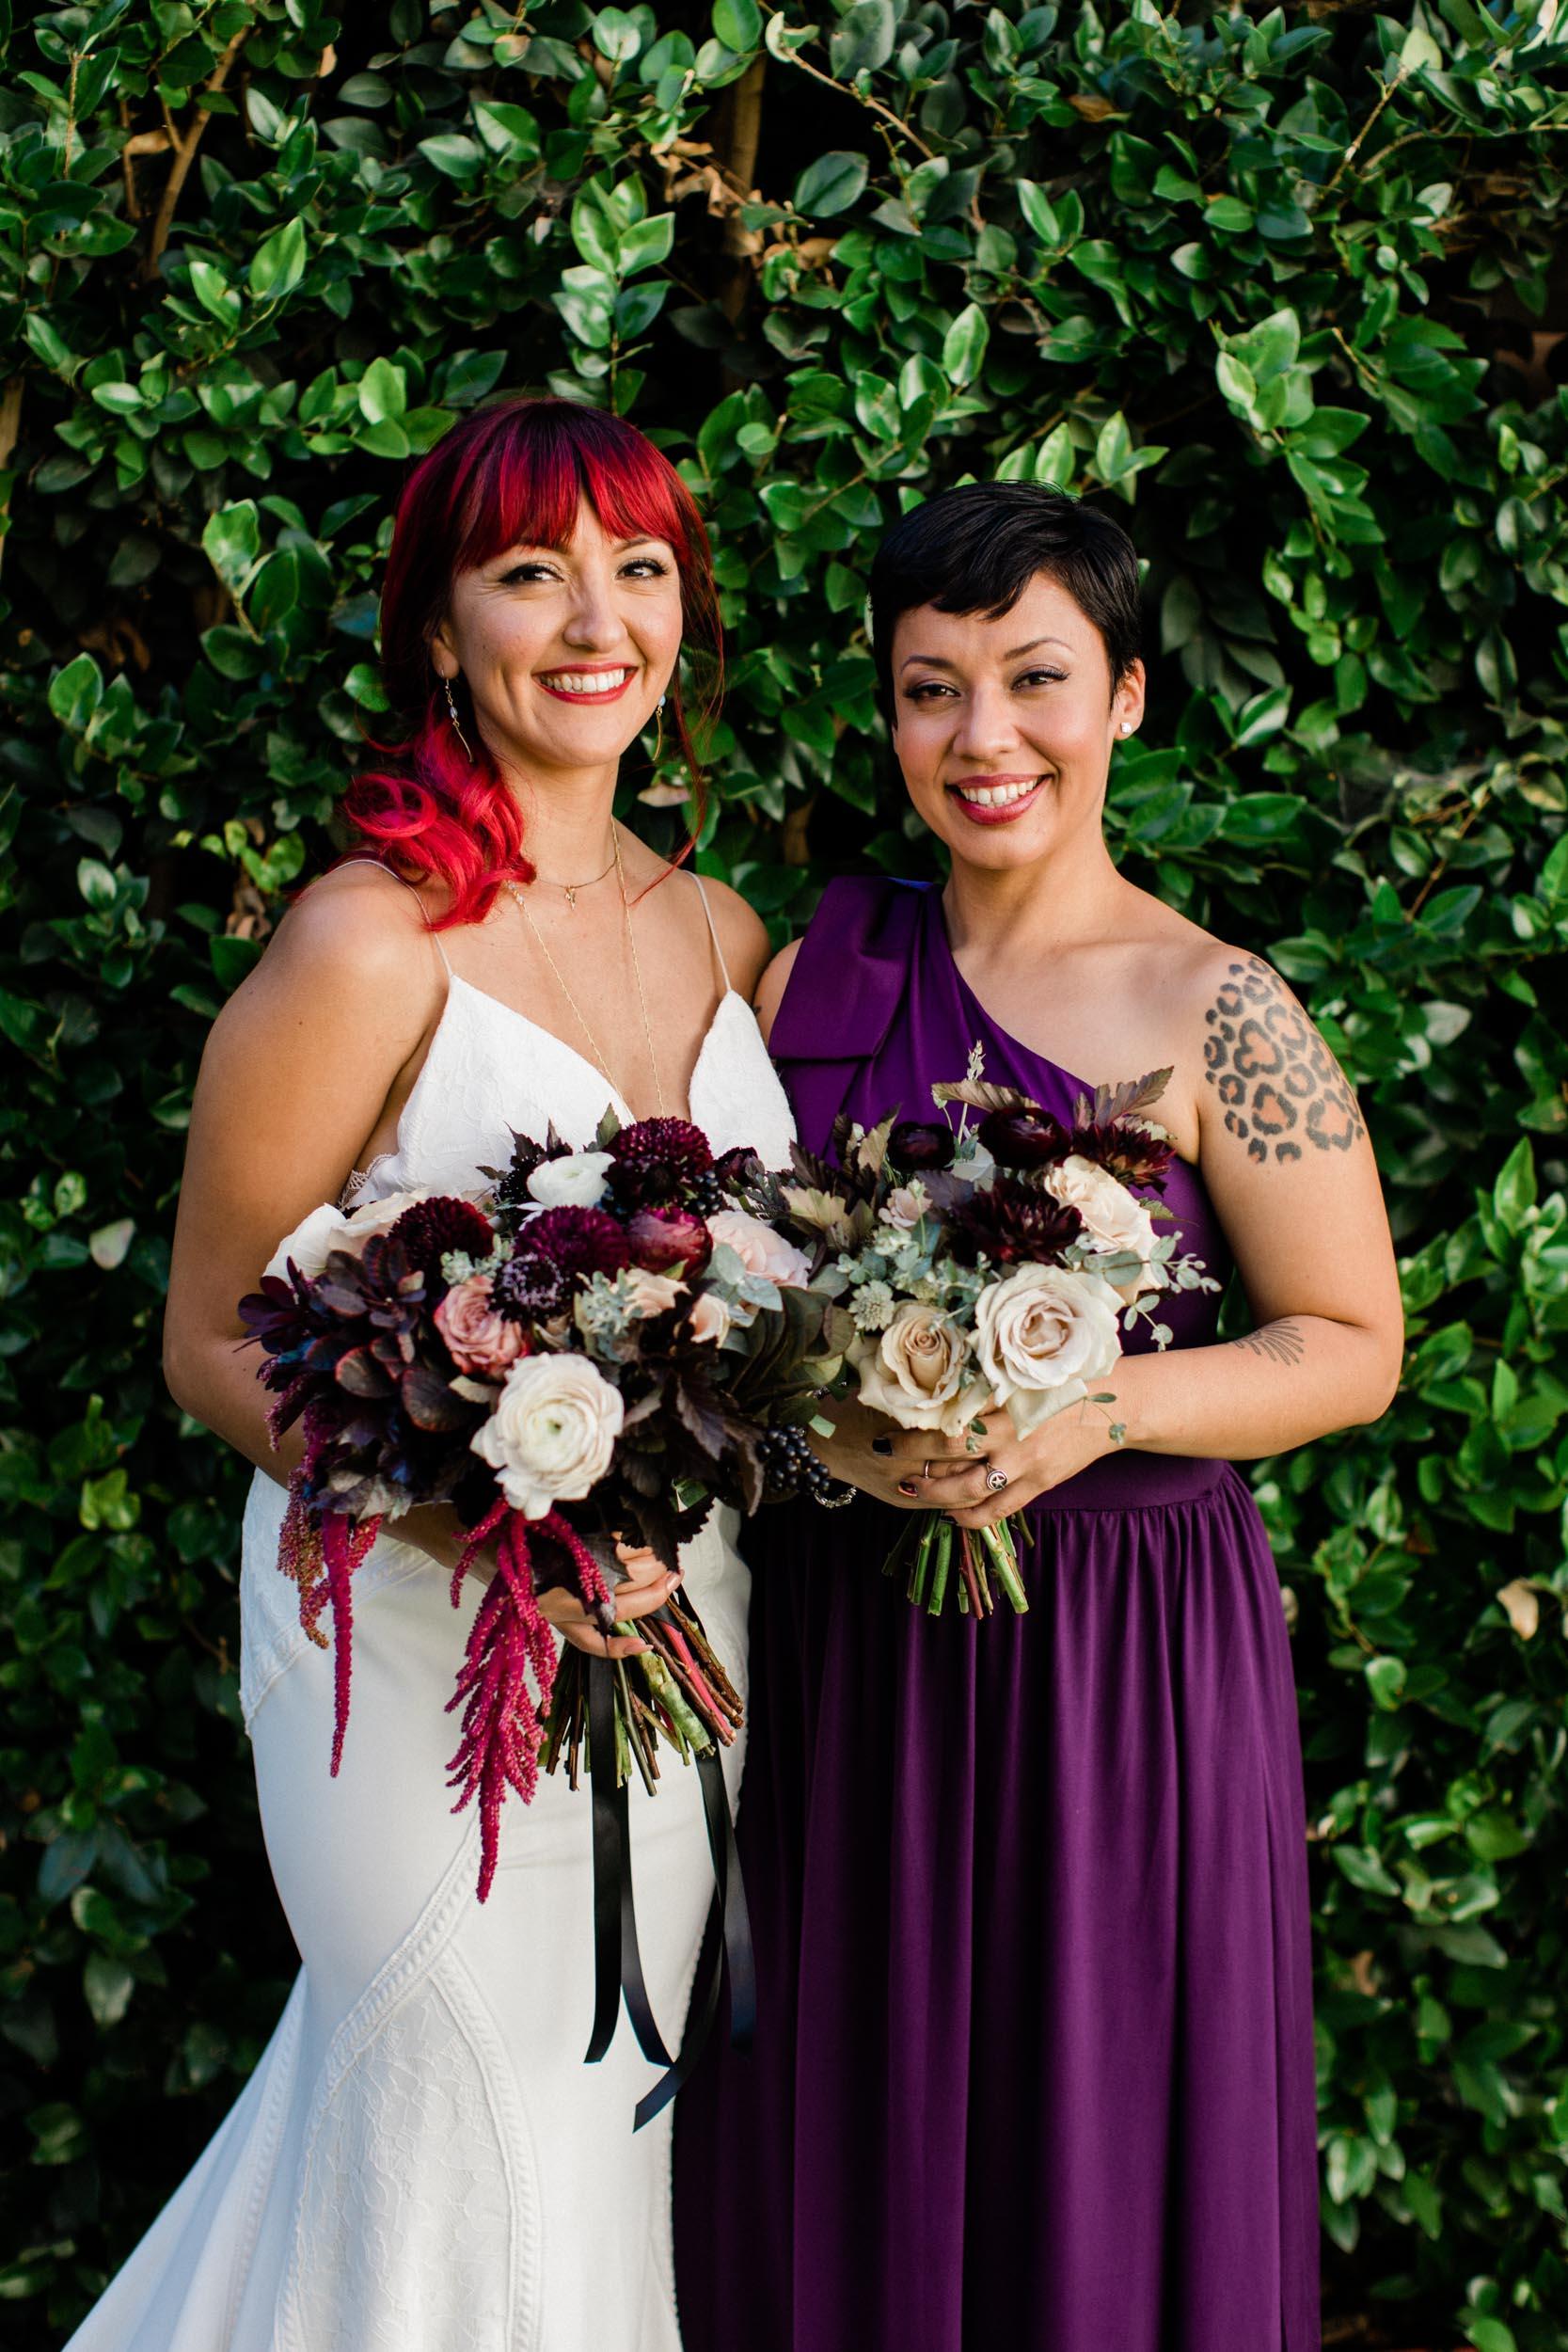 BKM-Photography-Los-Angeles-Highland-Park-York-Manor-Wedding-Photography-0422.jpg